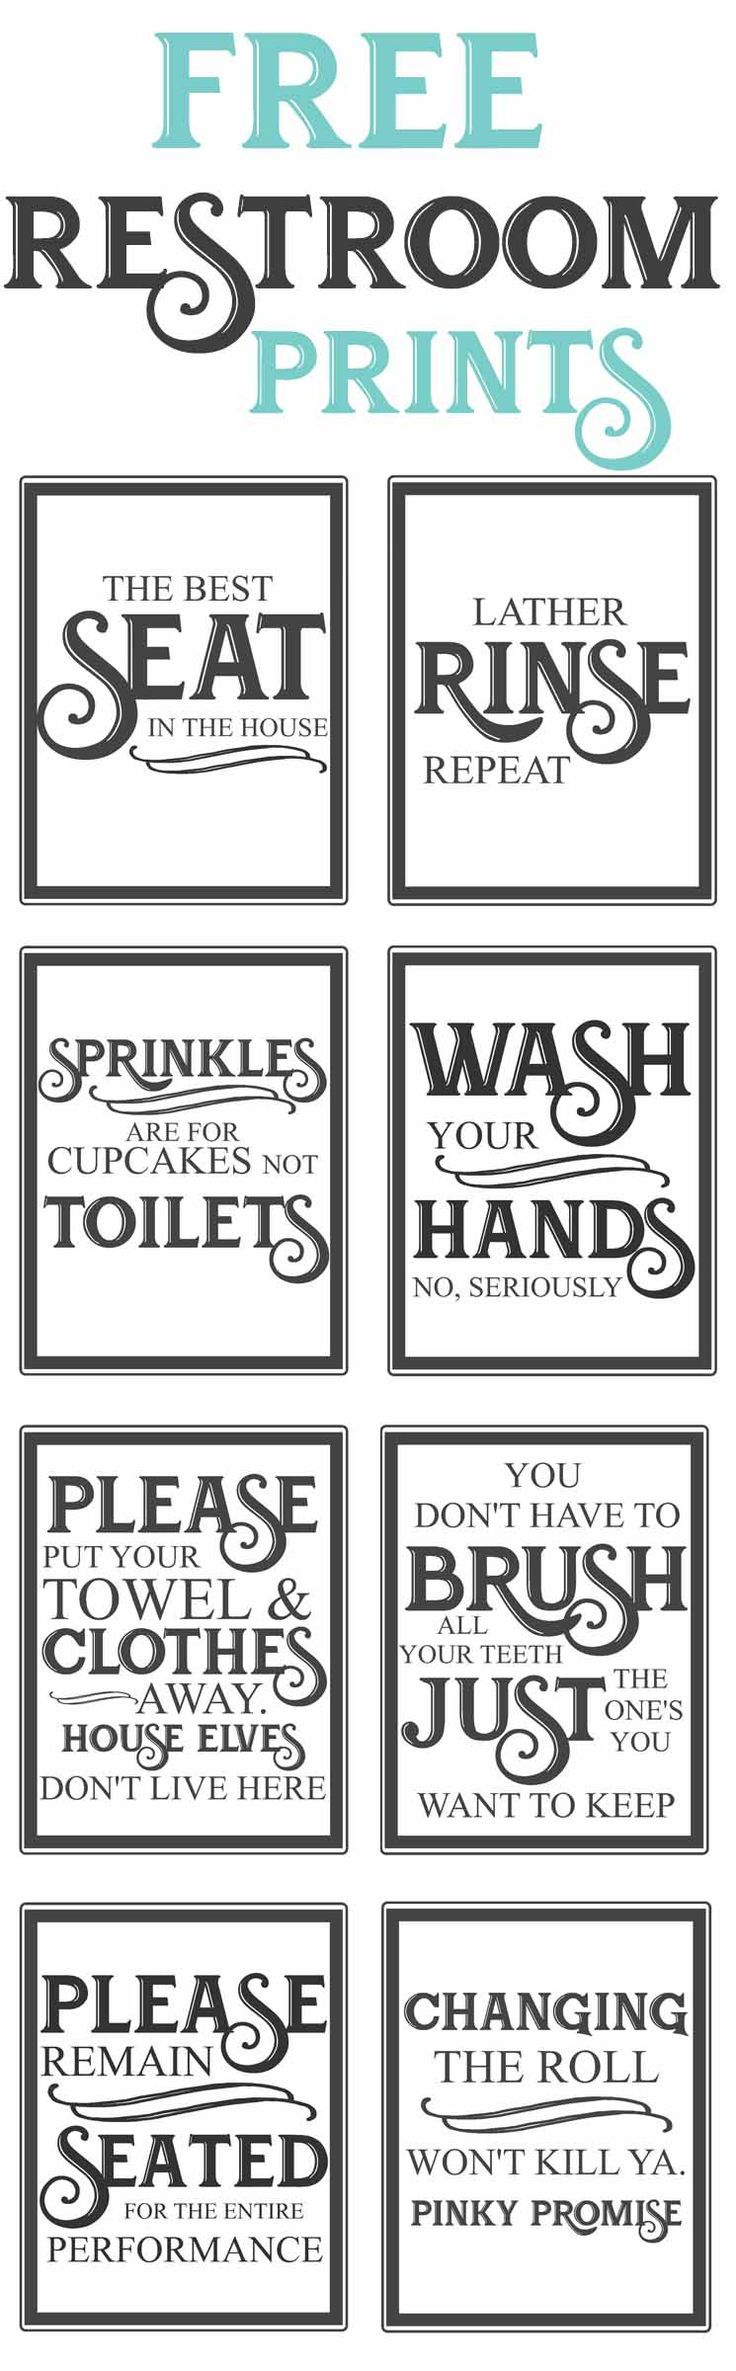 Free Vintage Bathroom Printables | Farmhouse | Diy Home Decor, Home - Free Printable Bathroom Signs